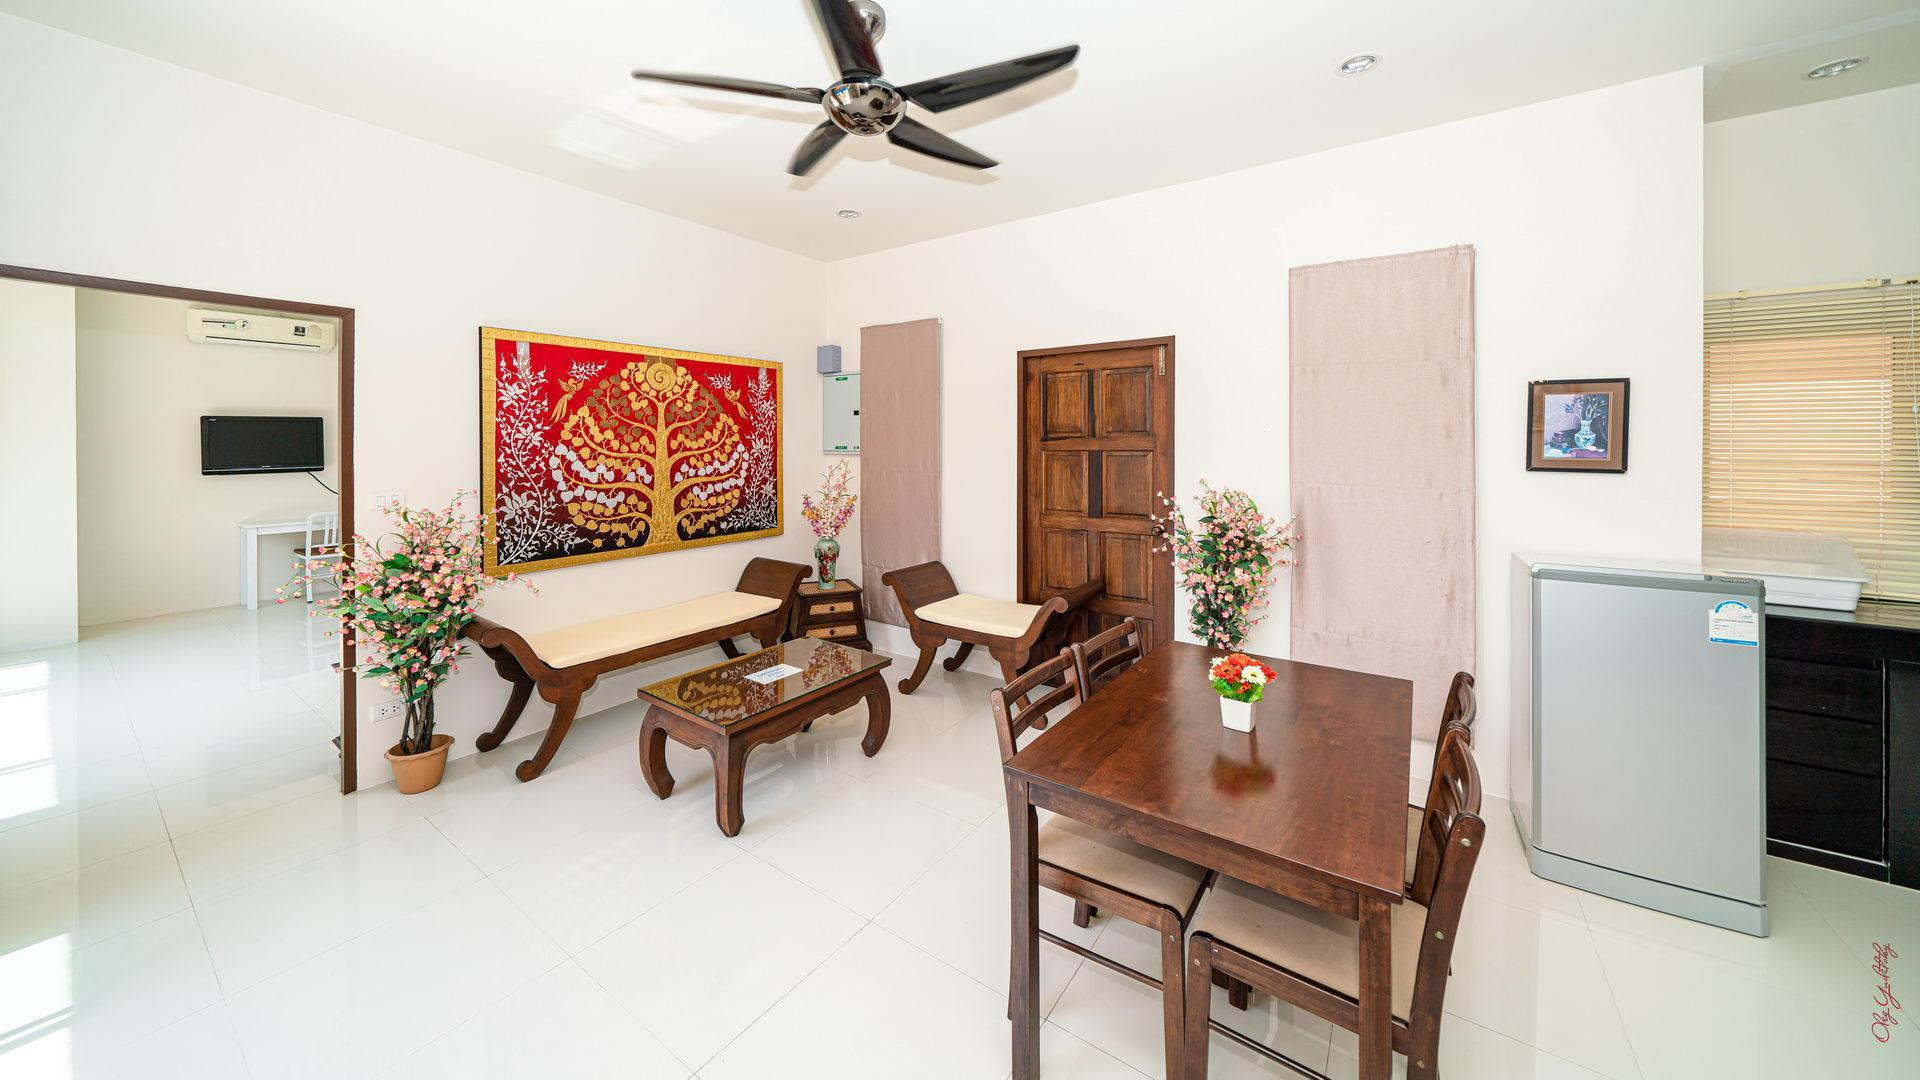 Thai Boutique villa V.09 (private beach) วิลลา 2 ห้องนอน 2 ห้องน้ำส่วนตัว ขนาด 130 ตร.ม. – หาดราไวย์